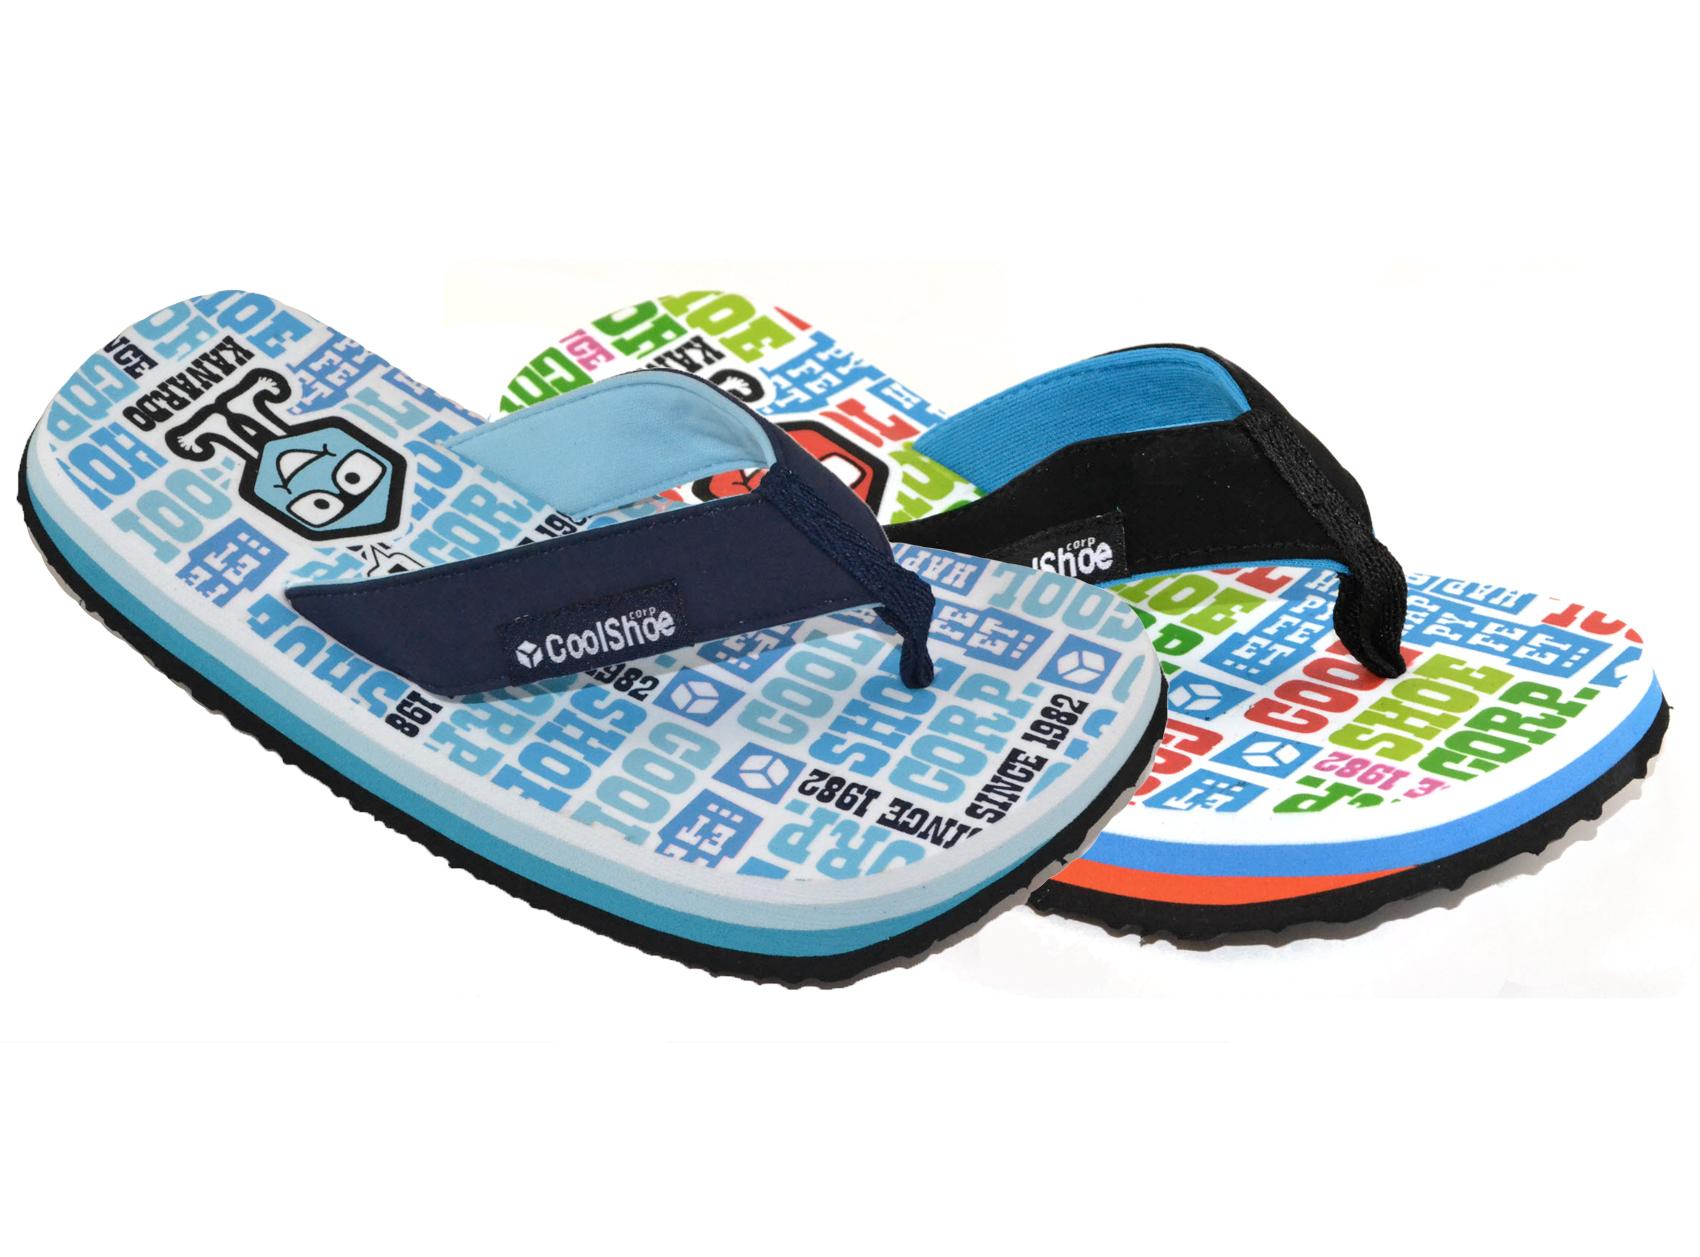 Cool Shoe Happy Feet Boys Flip Flops Sandals Children ...